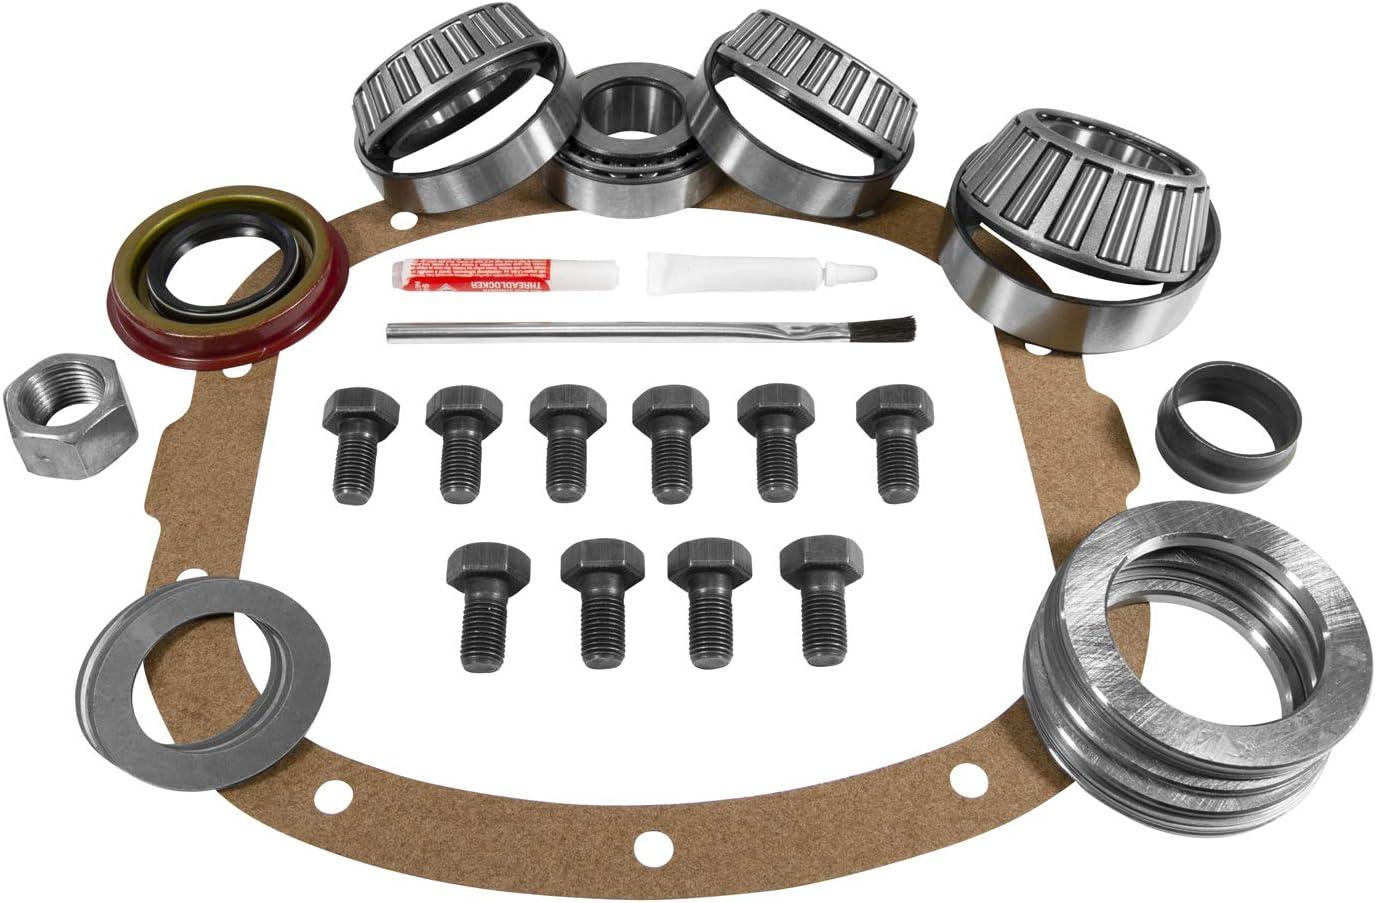 Yukon ZKGM7.5-B Master Overhaul Kit for GM 7.5//7.625 Differential